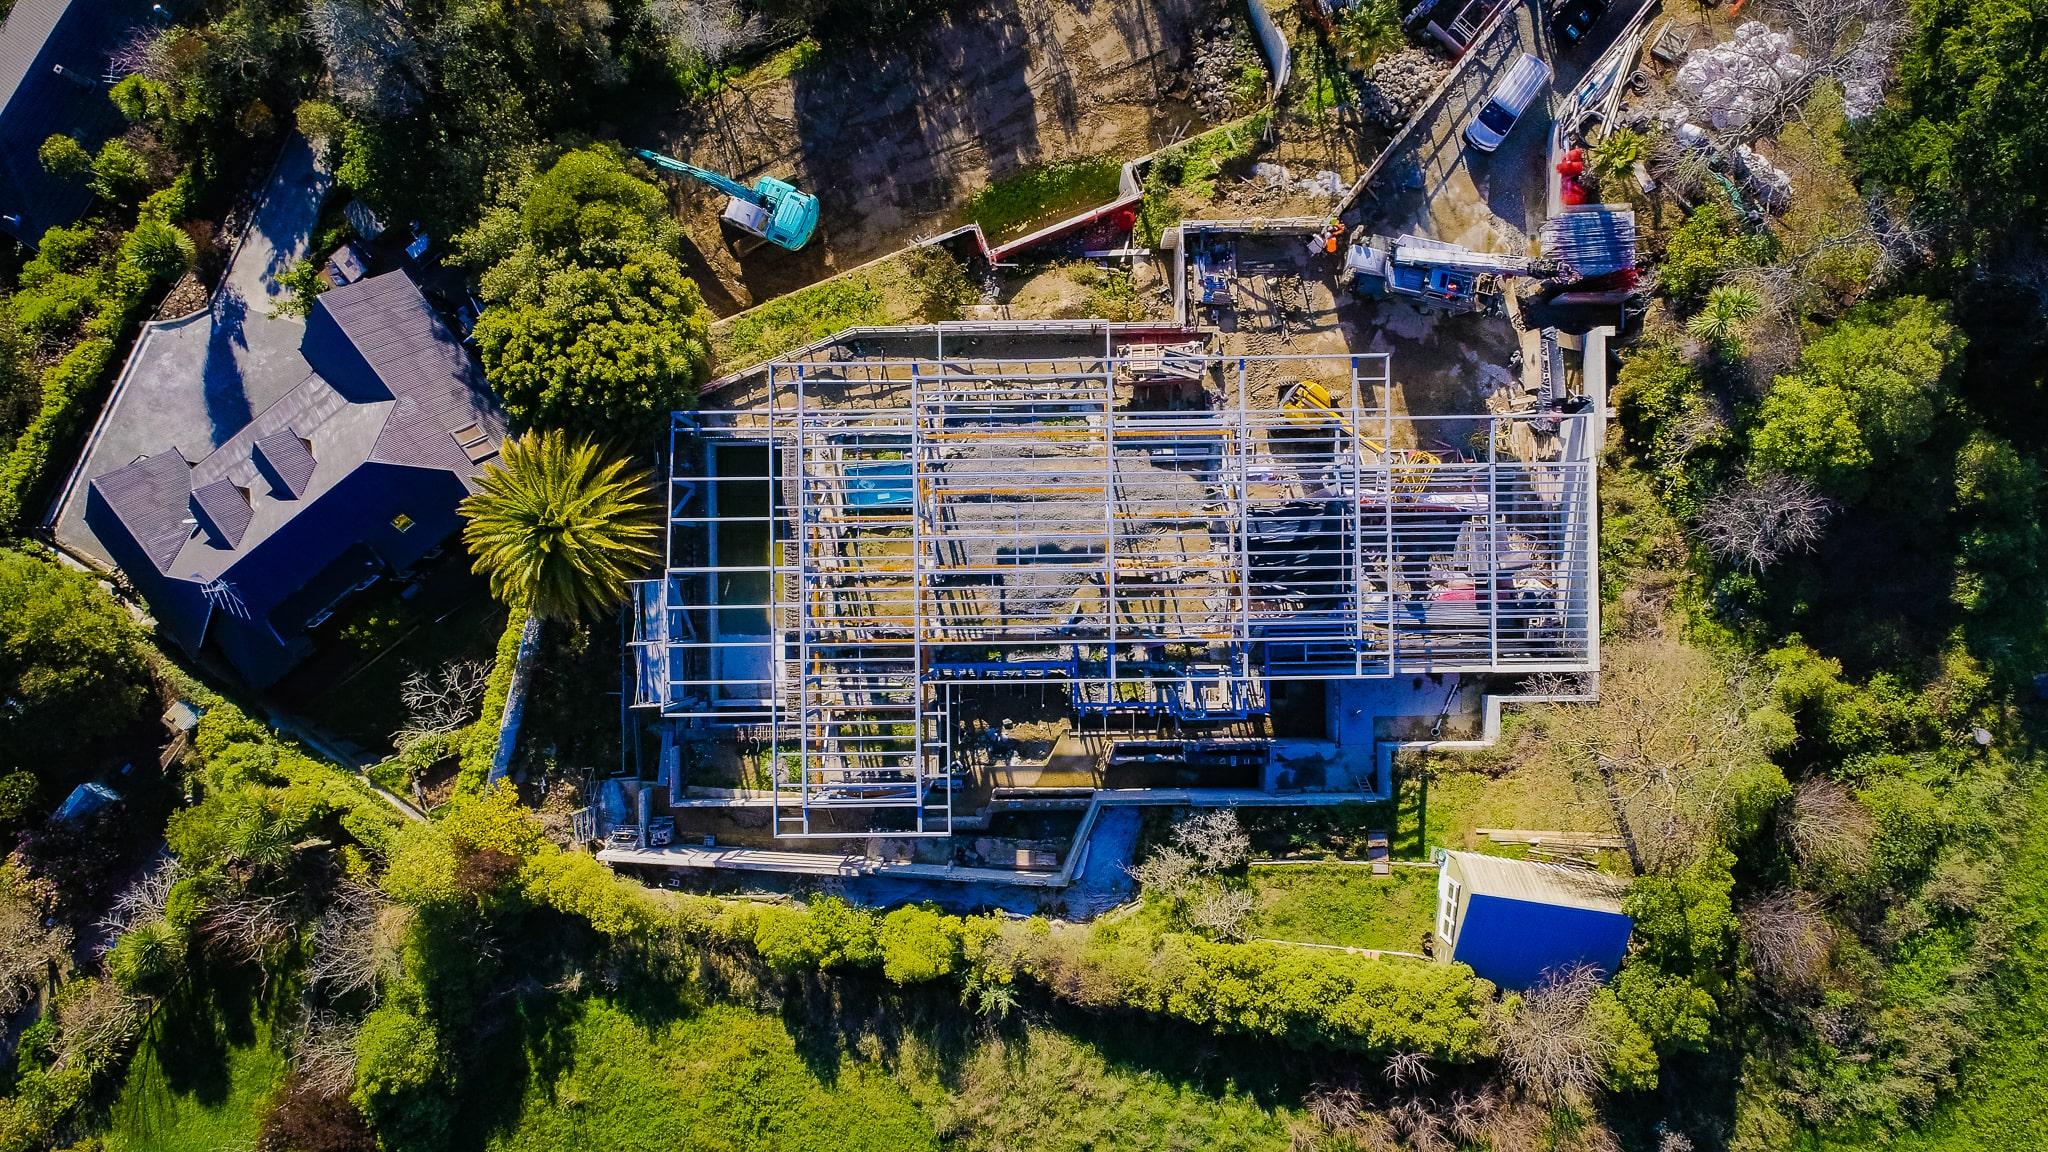 vip_steel_glenelg_residential_project_momac_pics_1